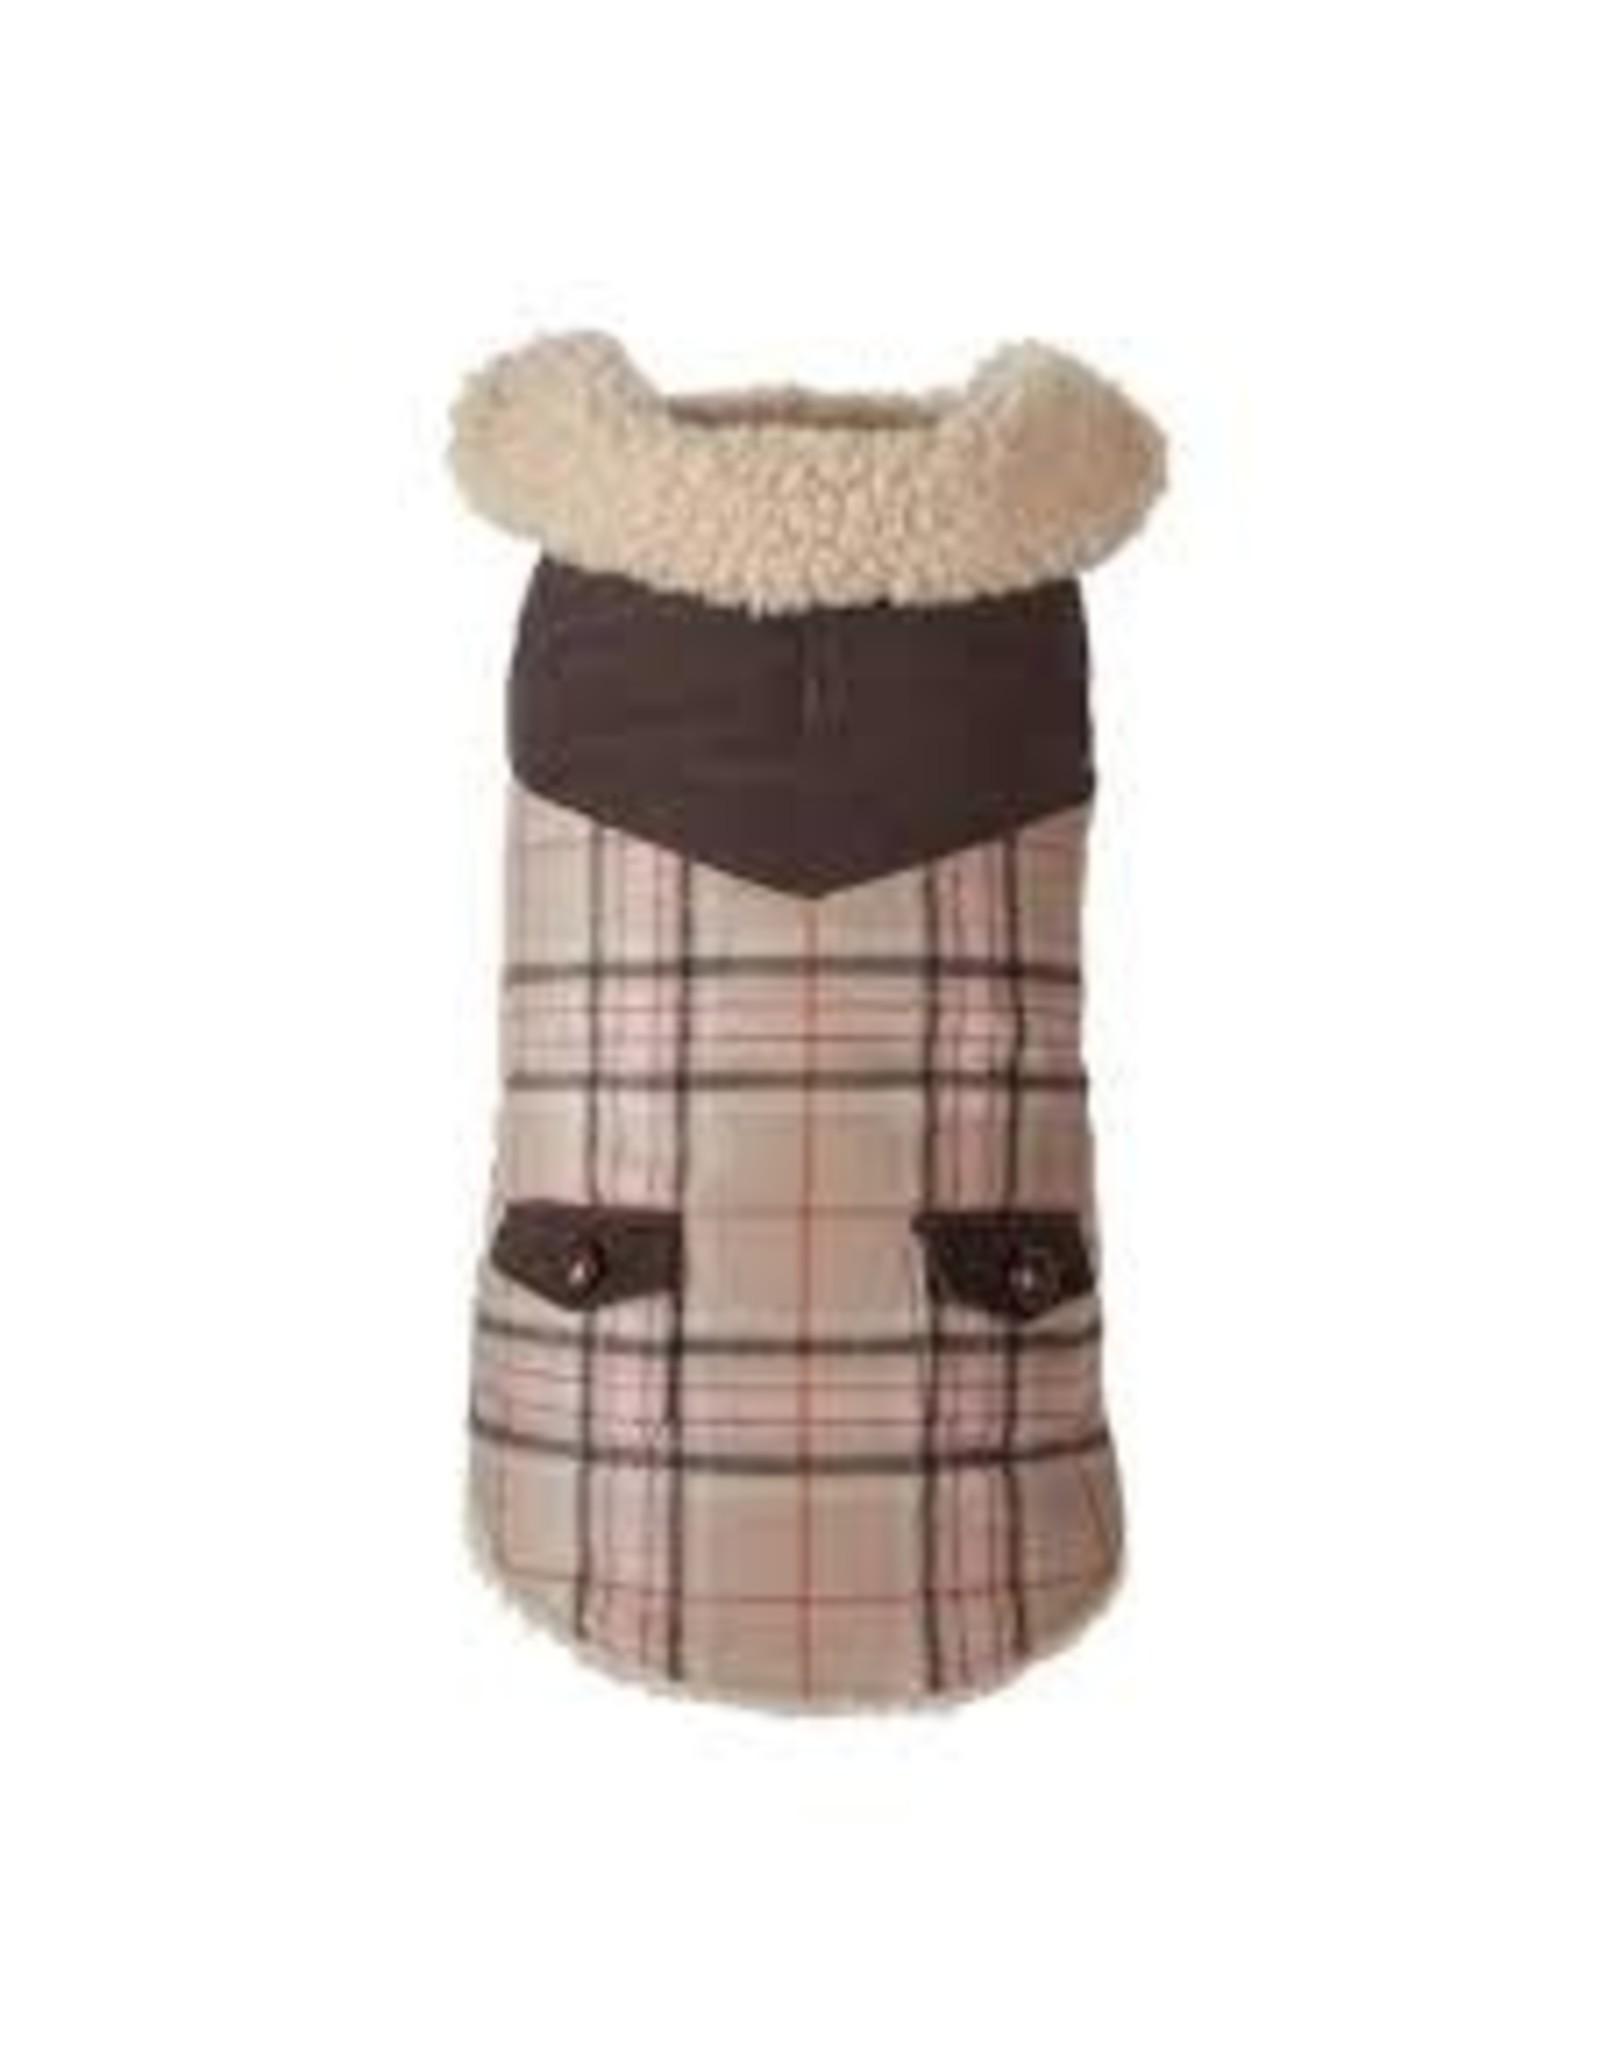 Fab Dog Fabdog Wool Plaid Shearling Dog Coat